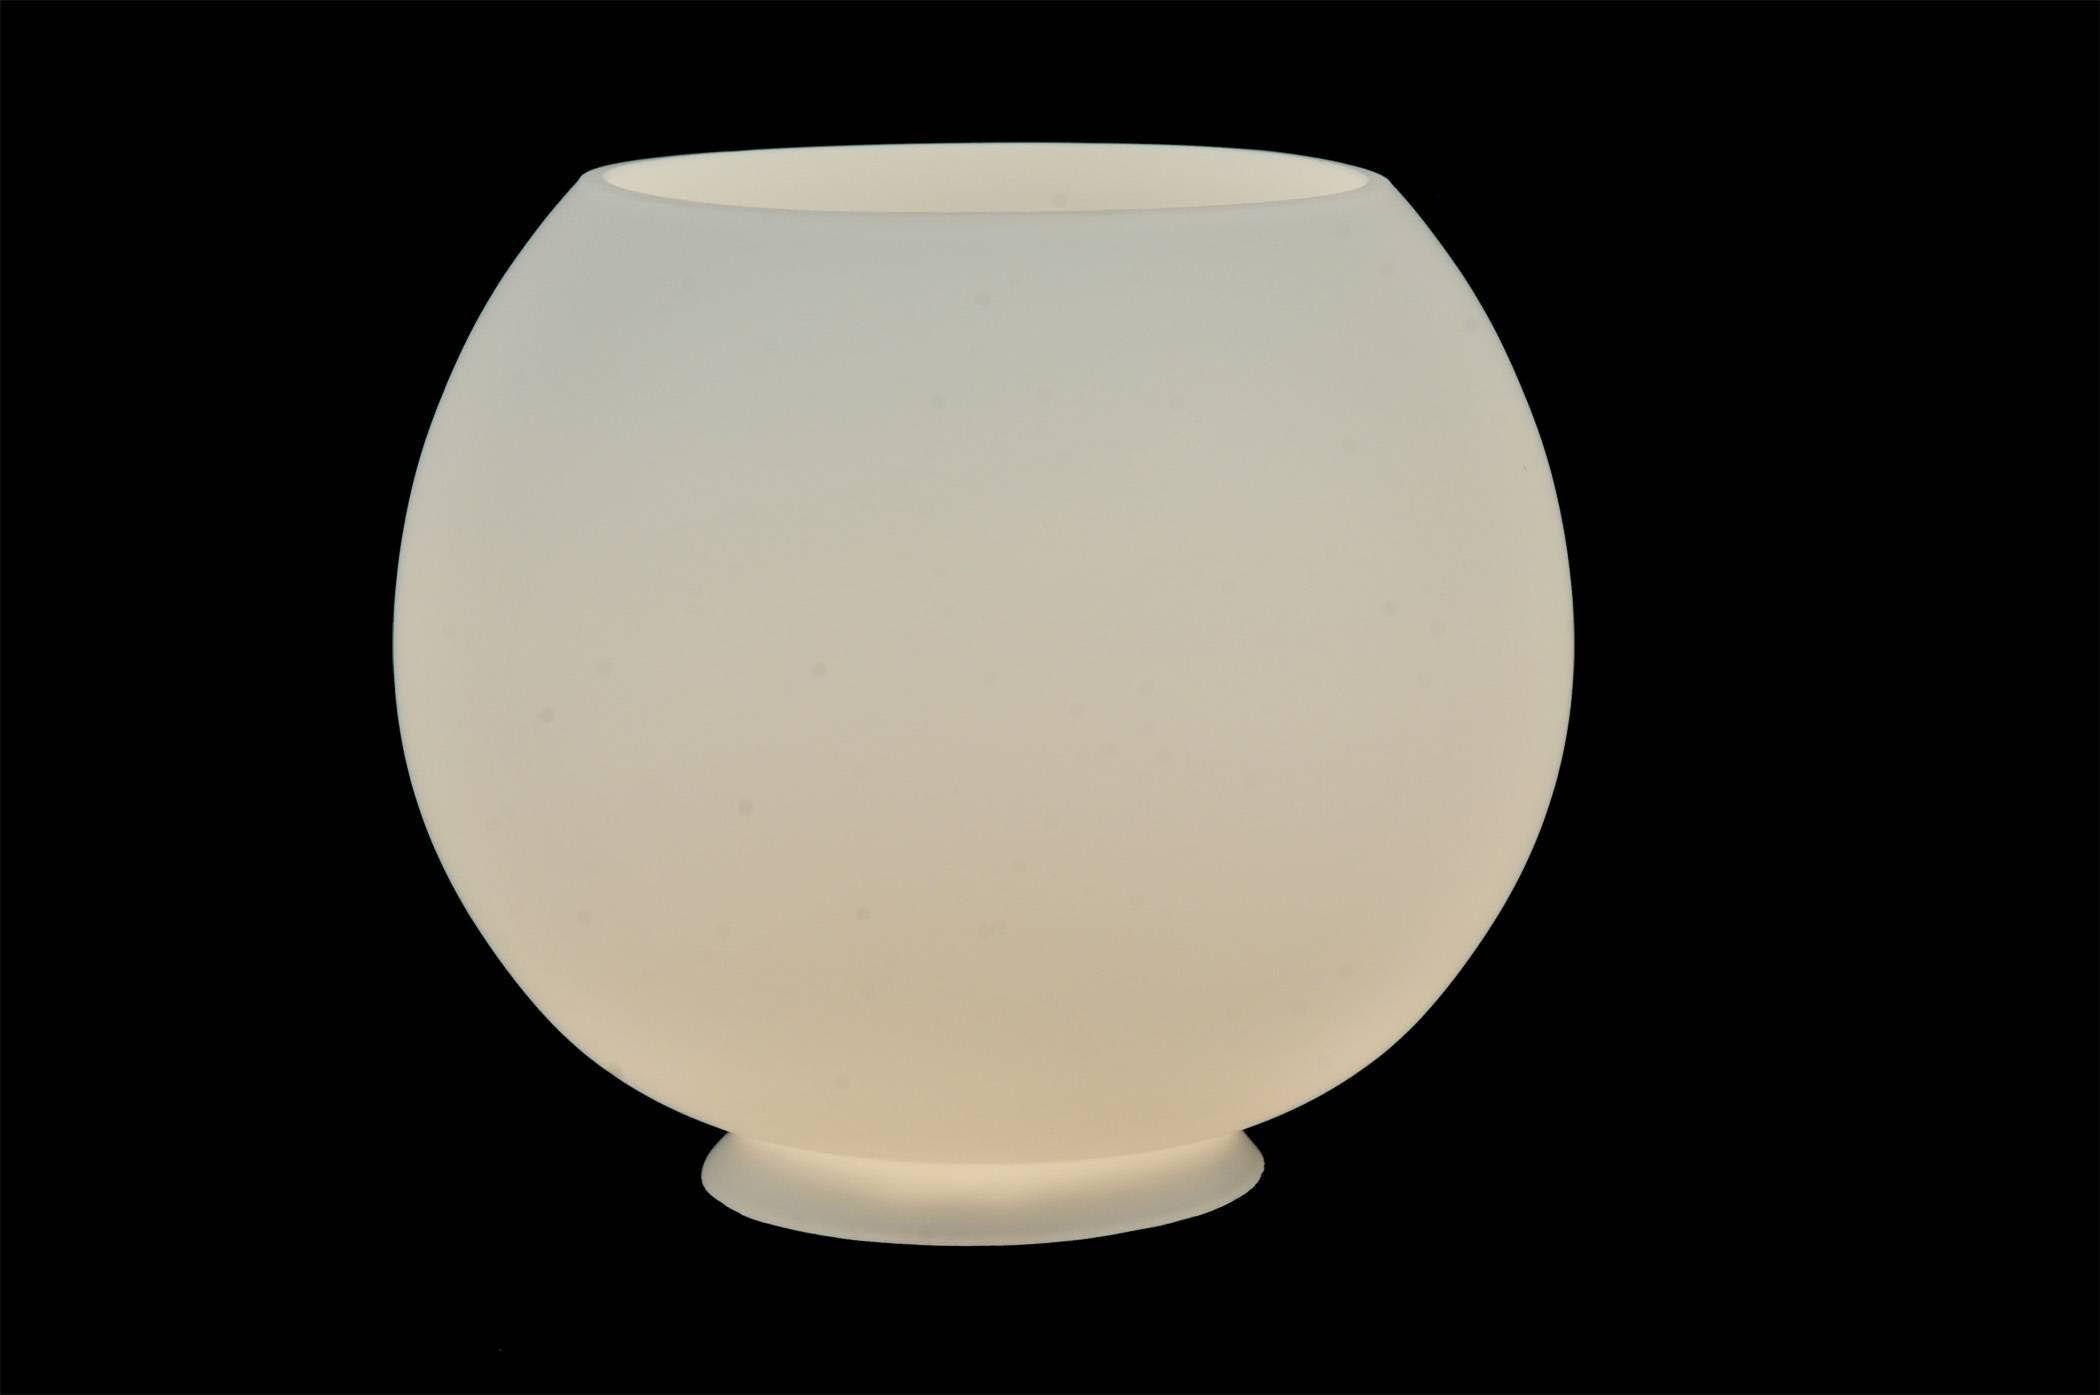 Chandelier Glass Replacement Globes Globe Light Fixture Glass